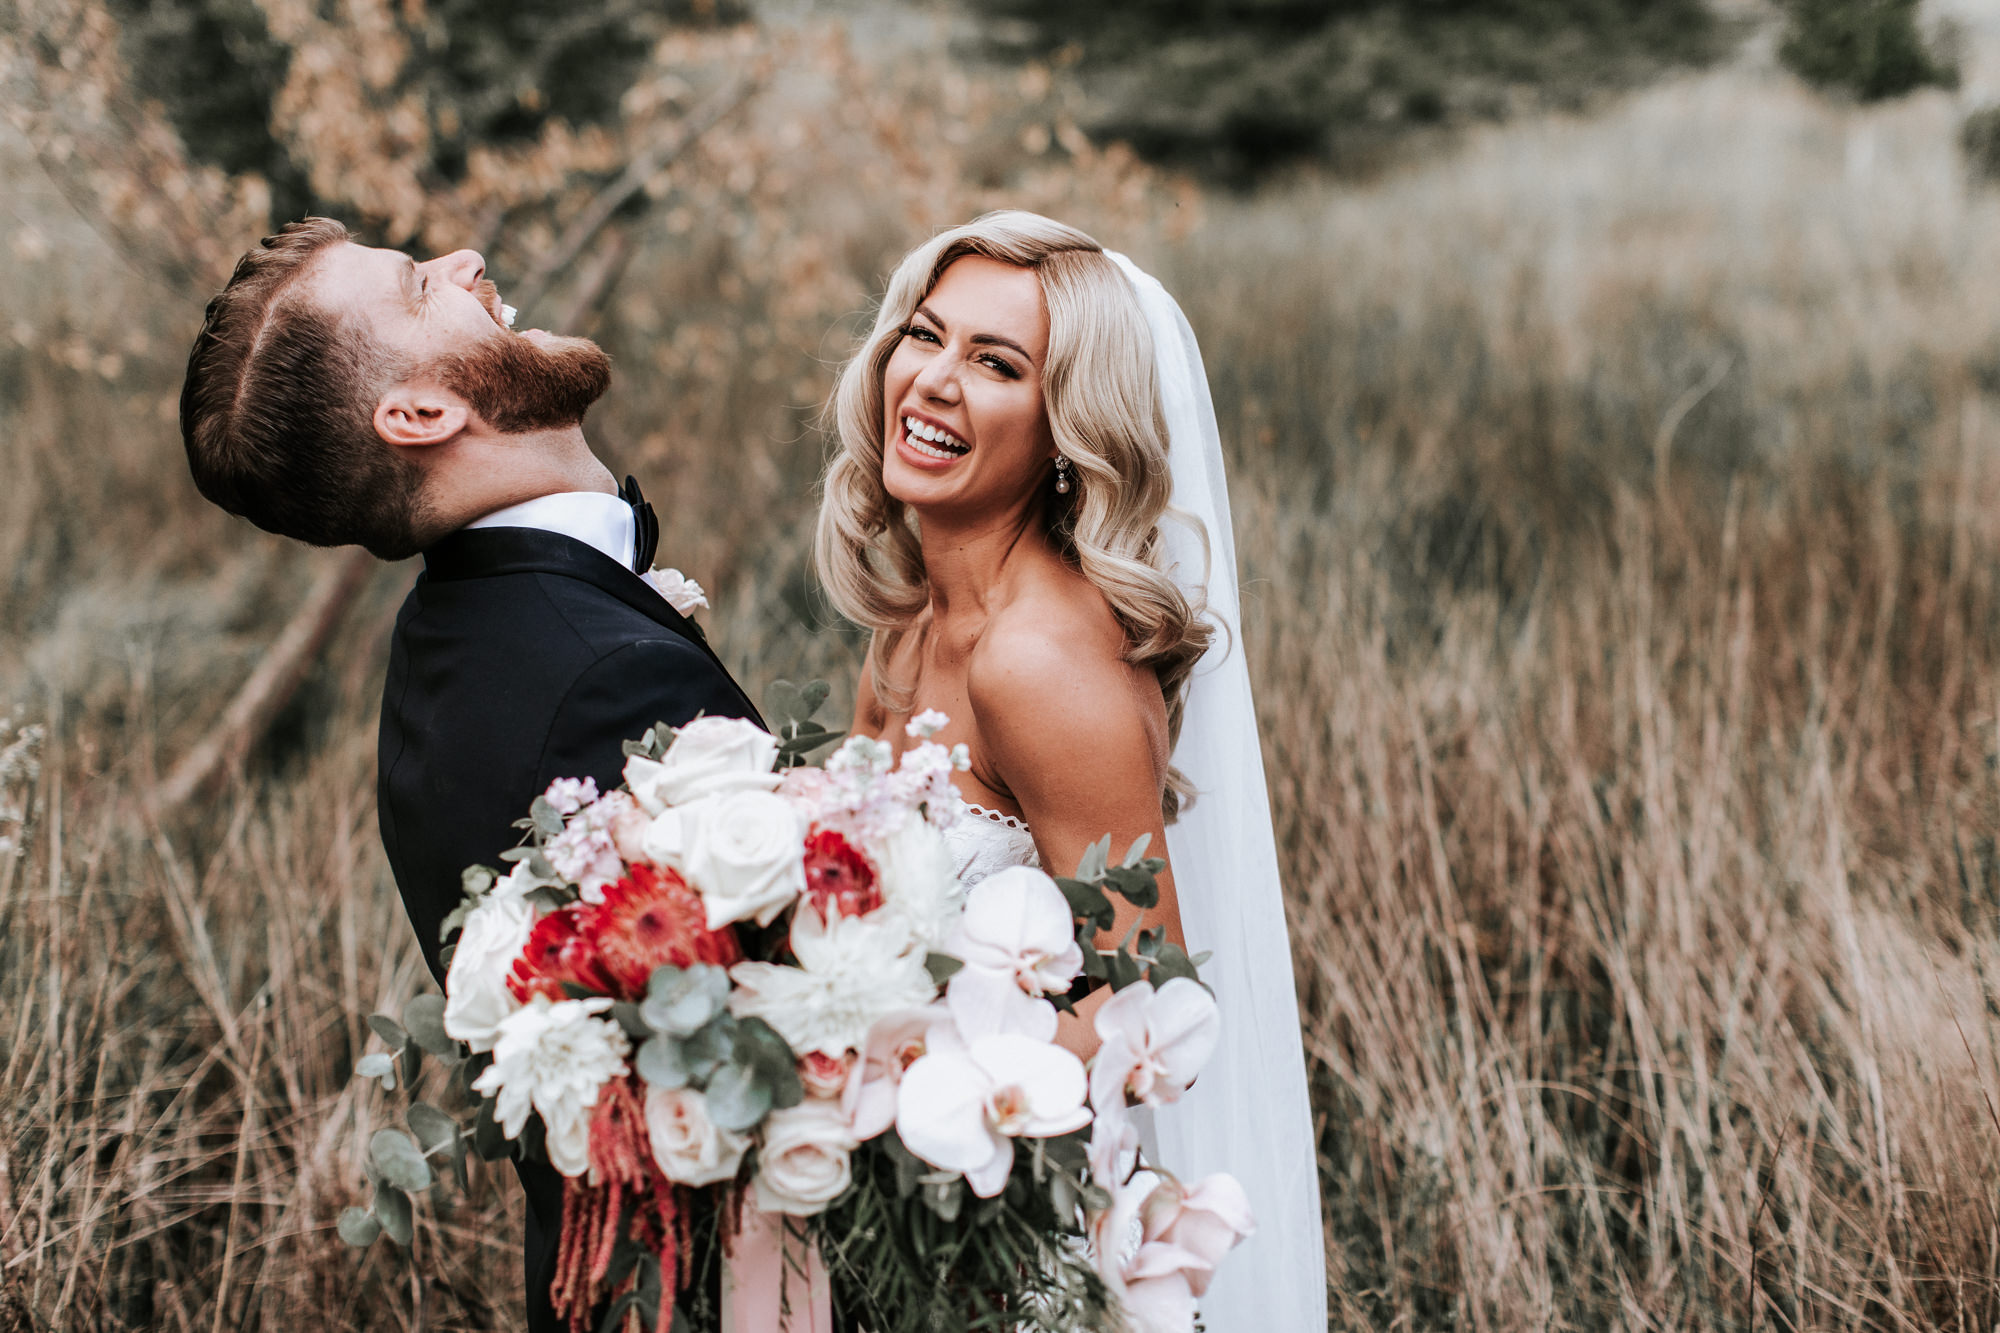 mali-brae-wedding-natalie-scott-baldwin-25.jpg